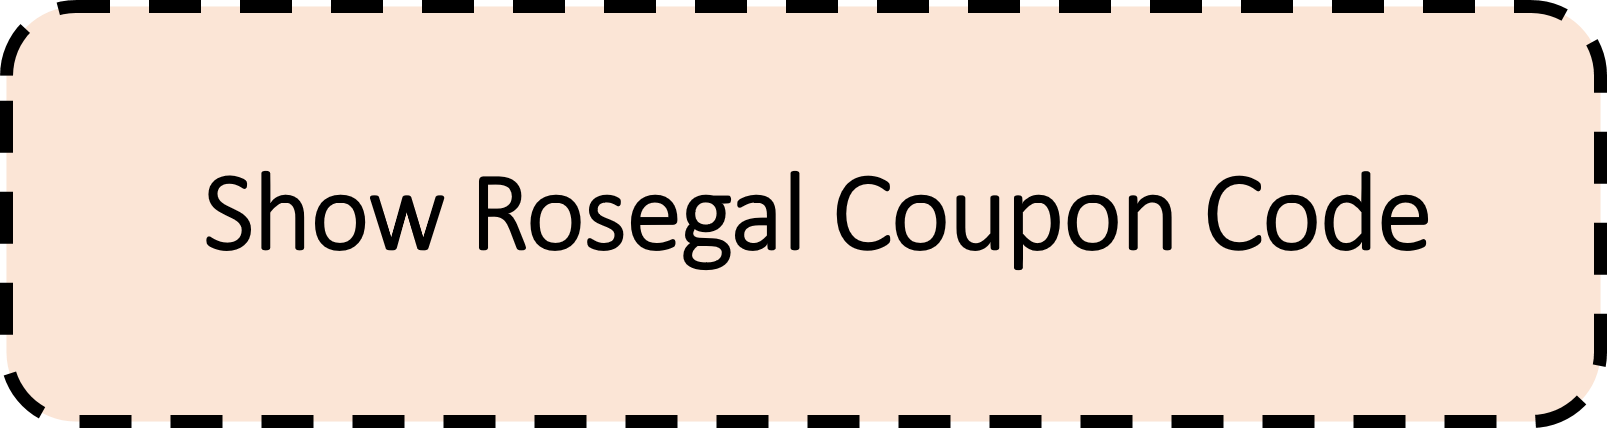 Rosegal coupon code